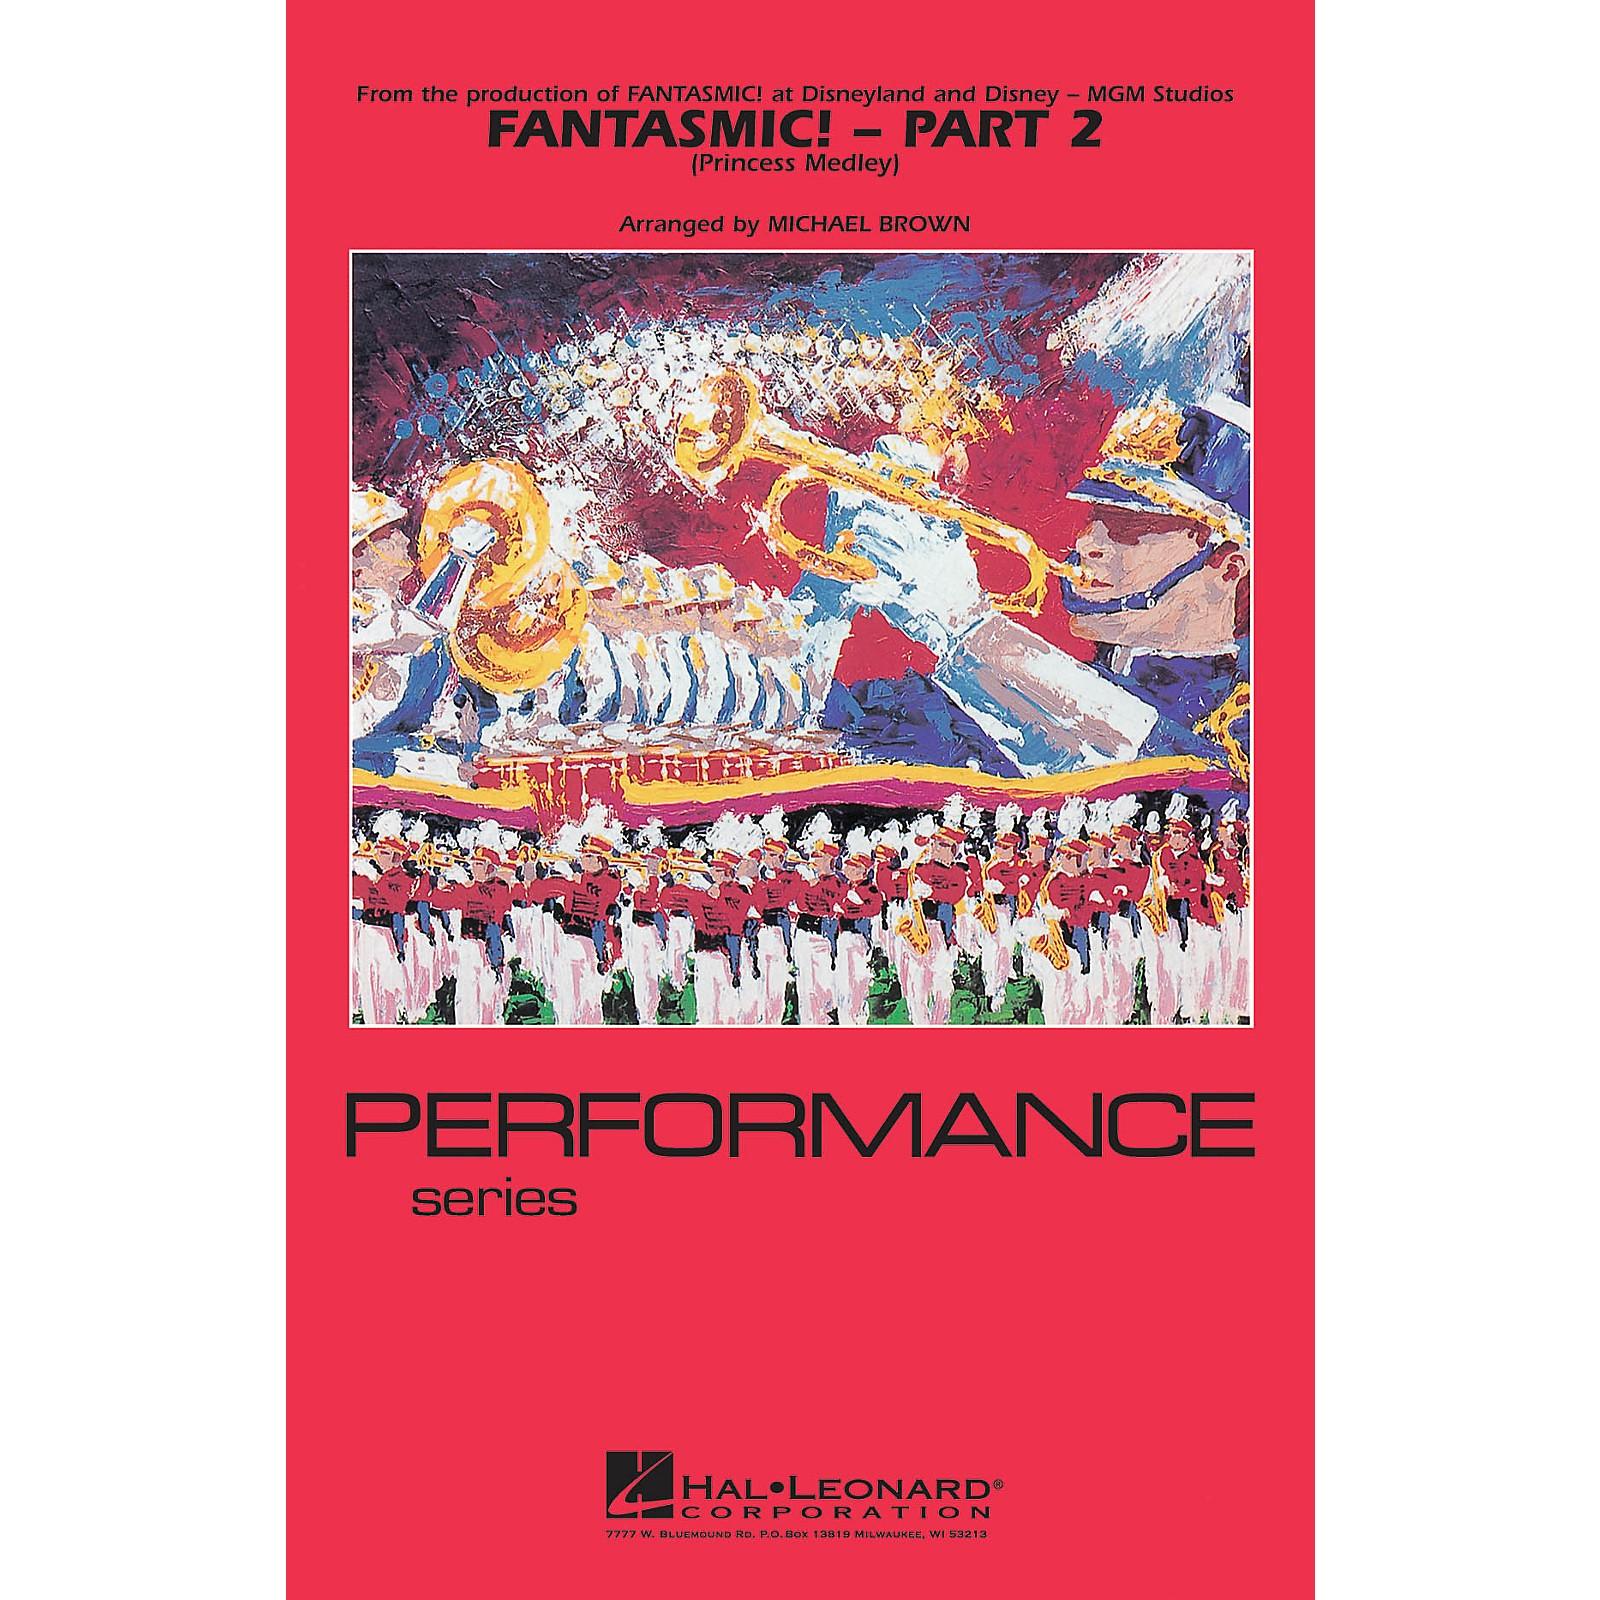 Hal Leonard Fantasmic! - Part 2 (Princess Medley) Marching Band Level 3-4 Arranged by Michael Brown